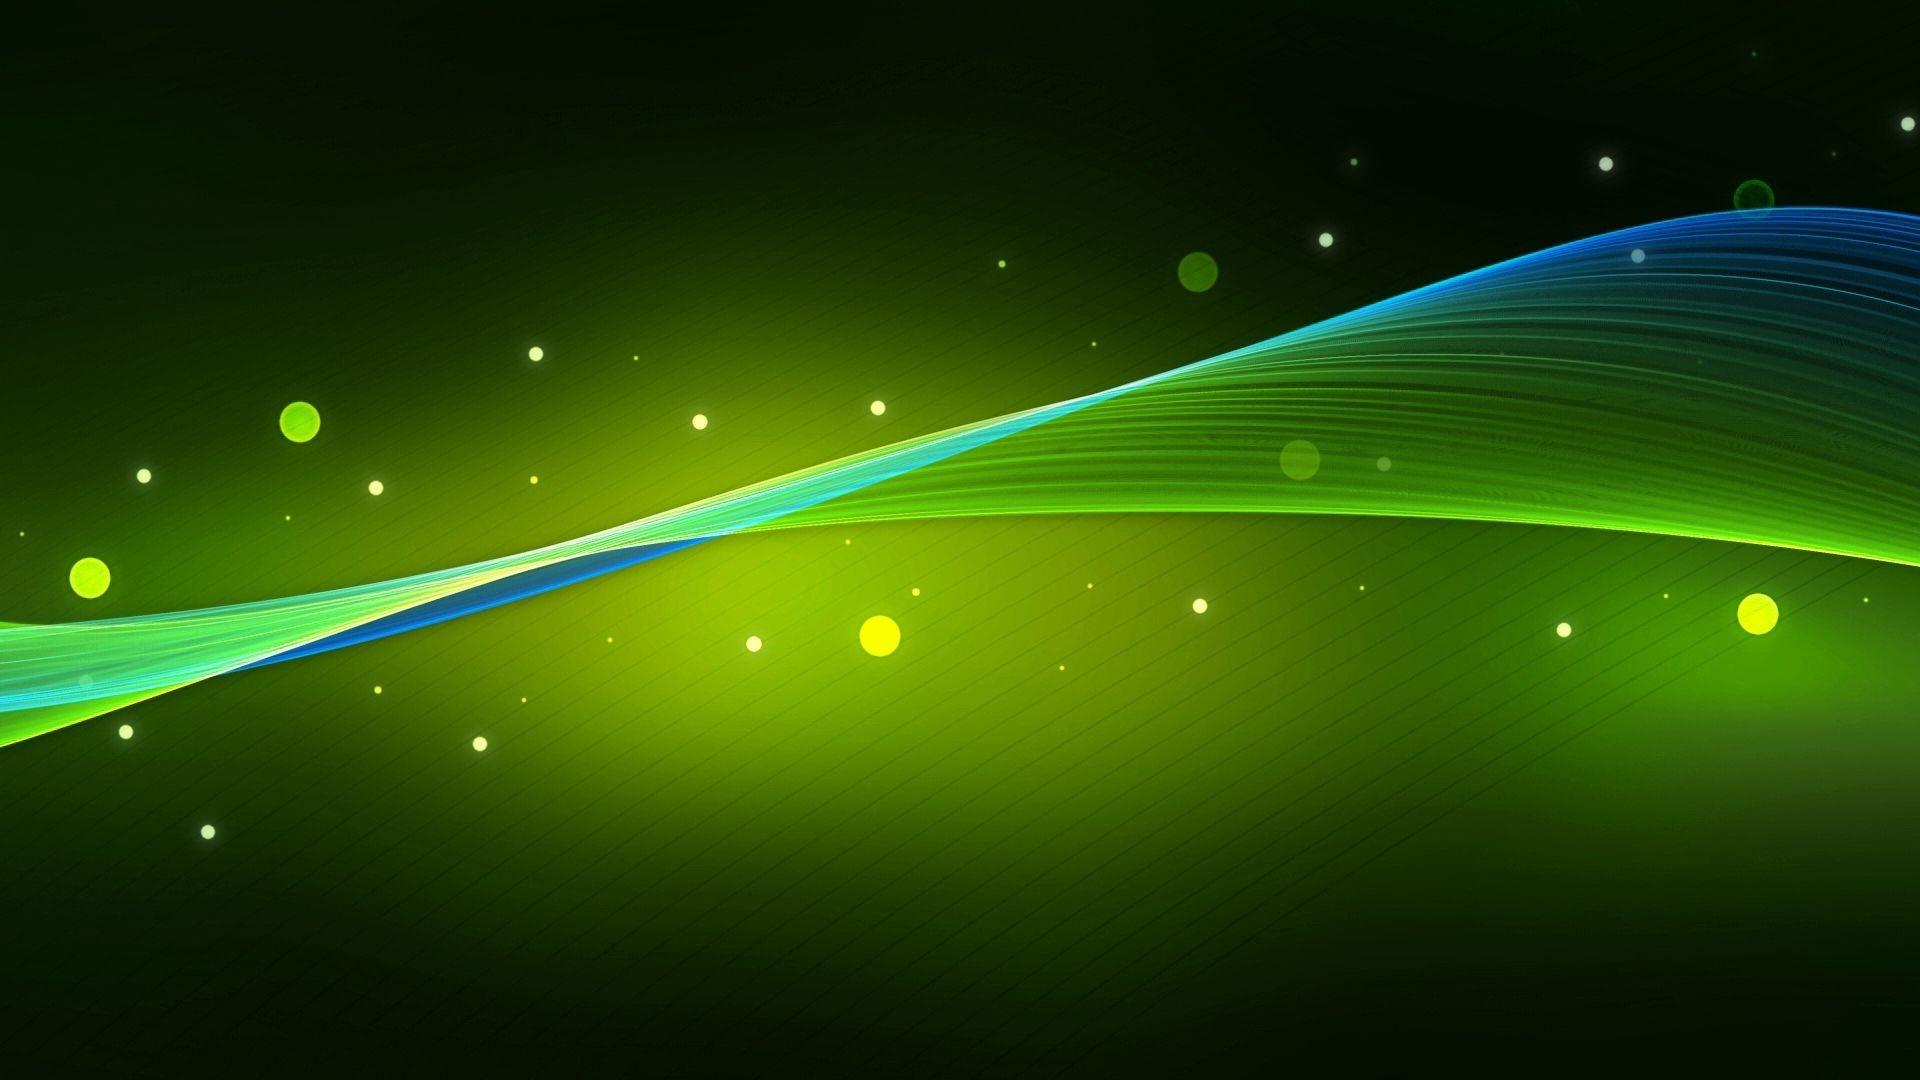 [41+] Green Wallpaper 1920x1080 on WallpaperSafari Abstract Green Desktop Wallpaper